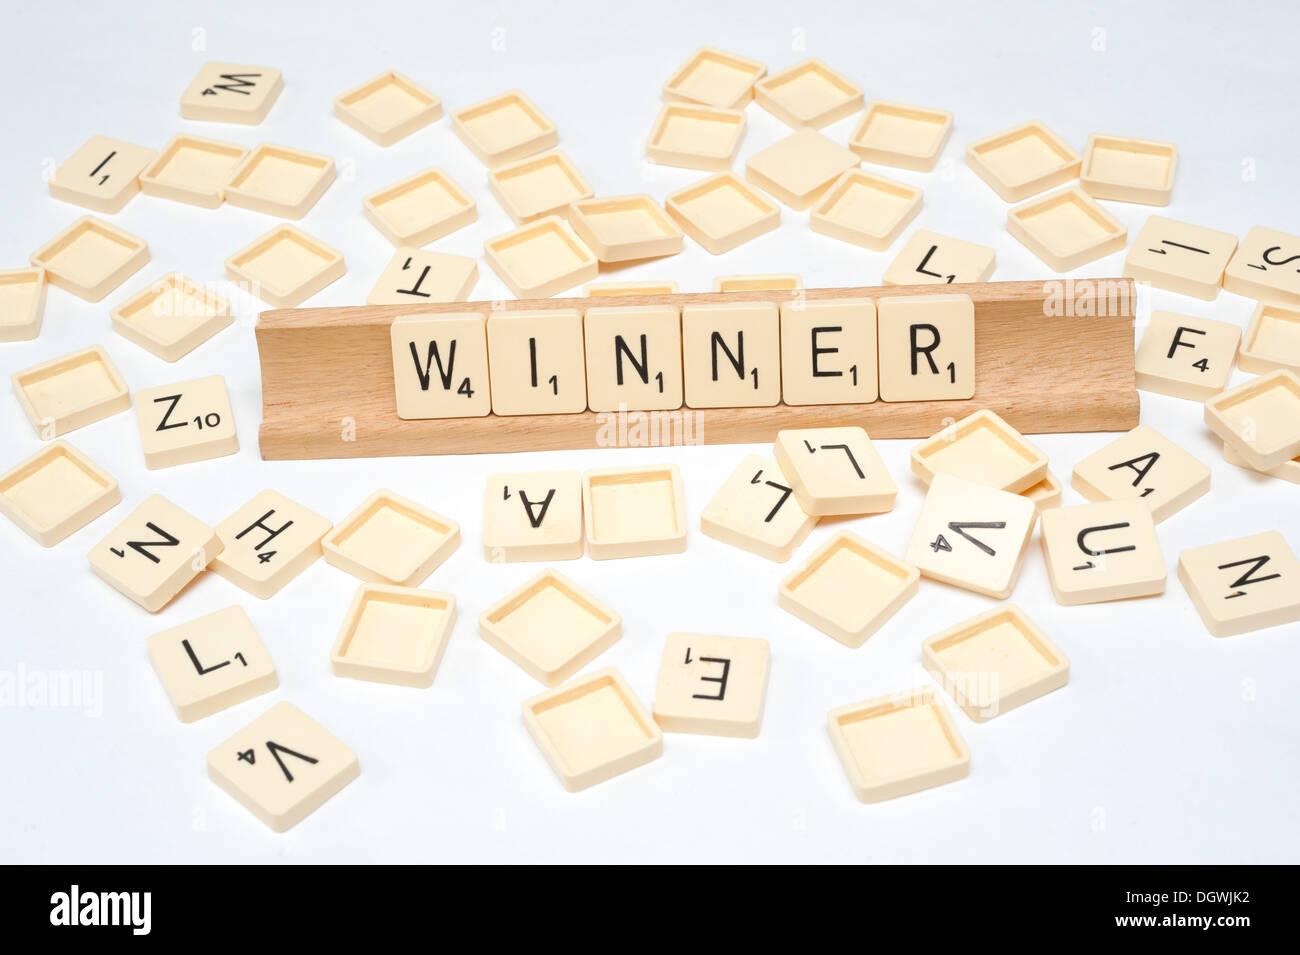 'Winner' written in scrabble tiles - Stock Image